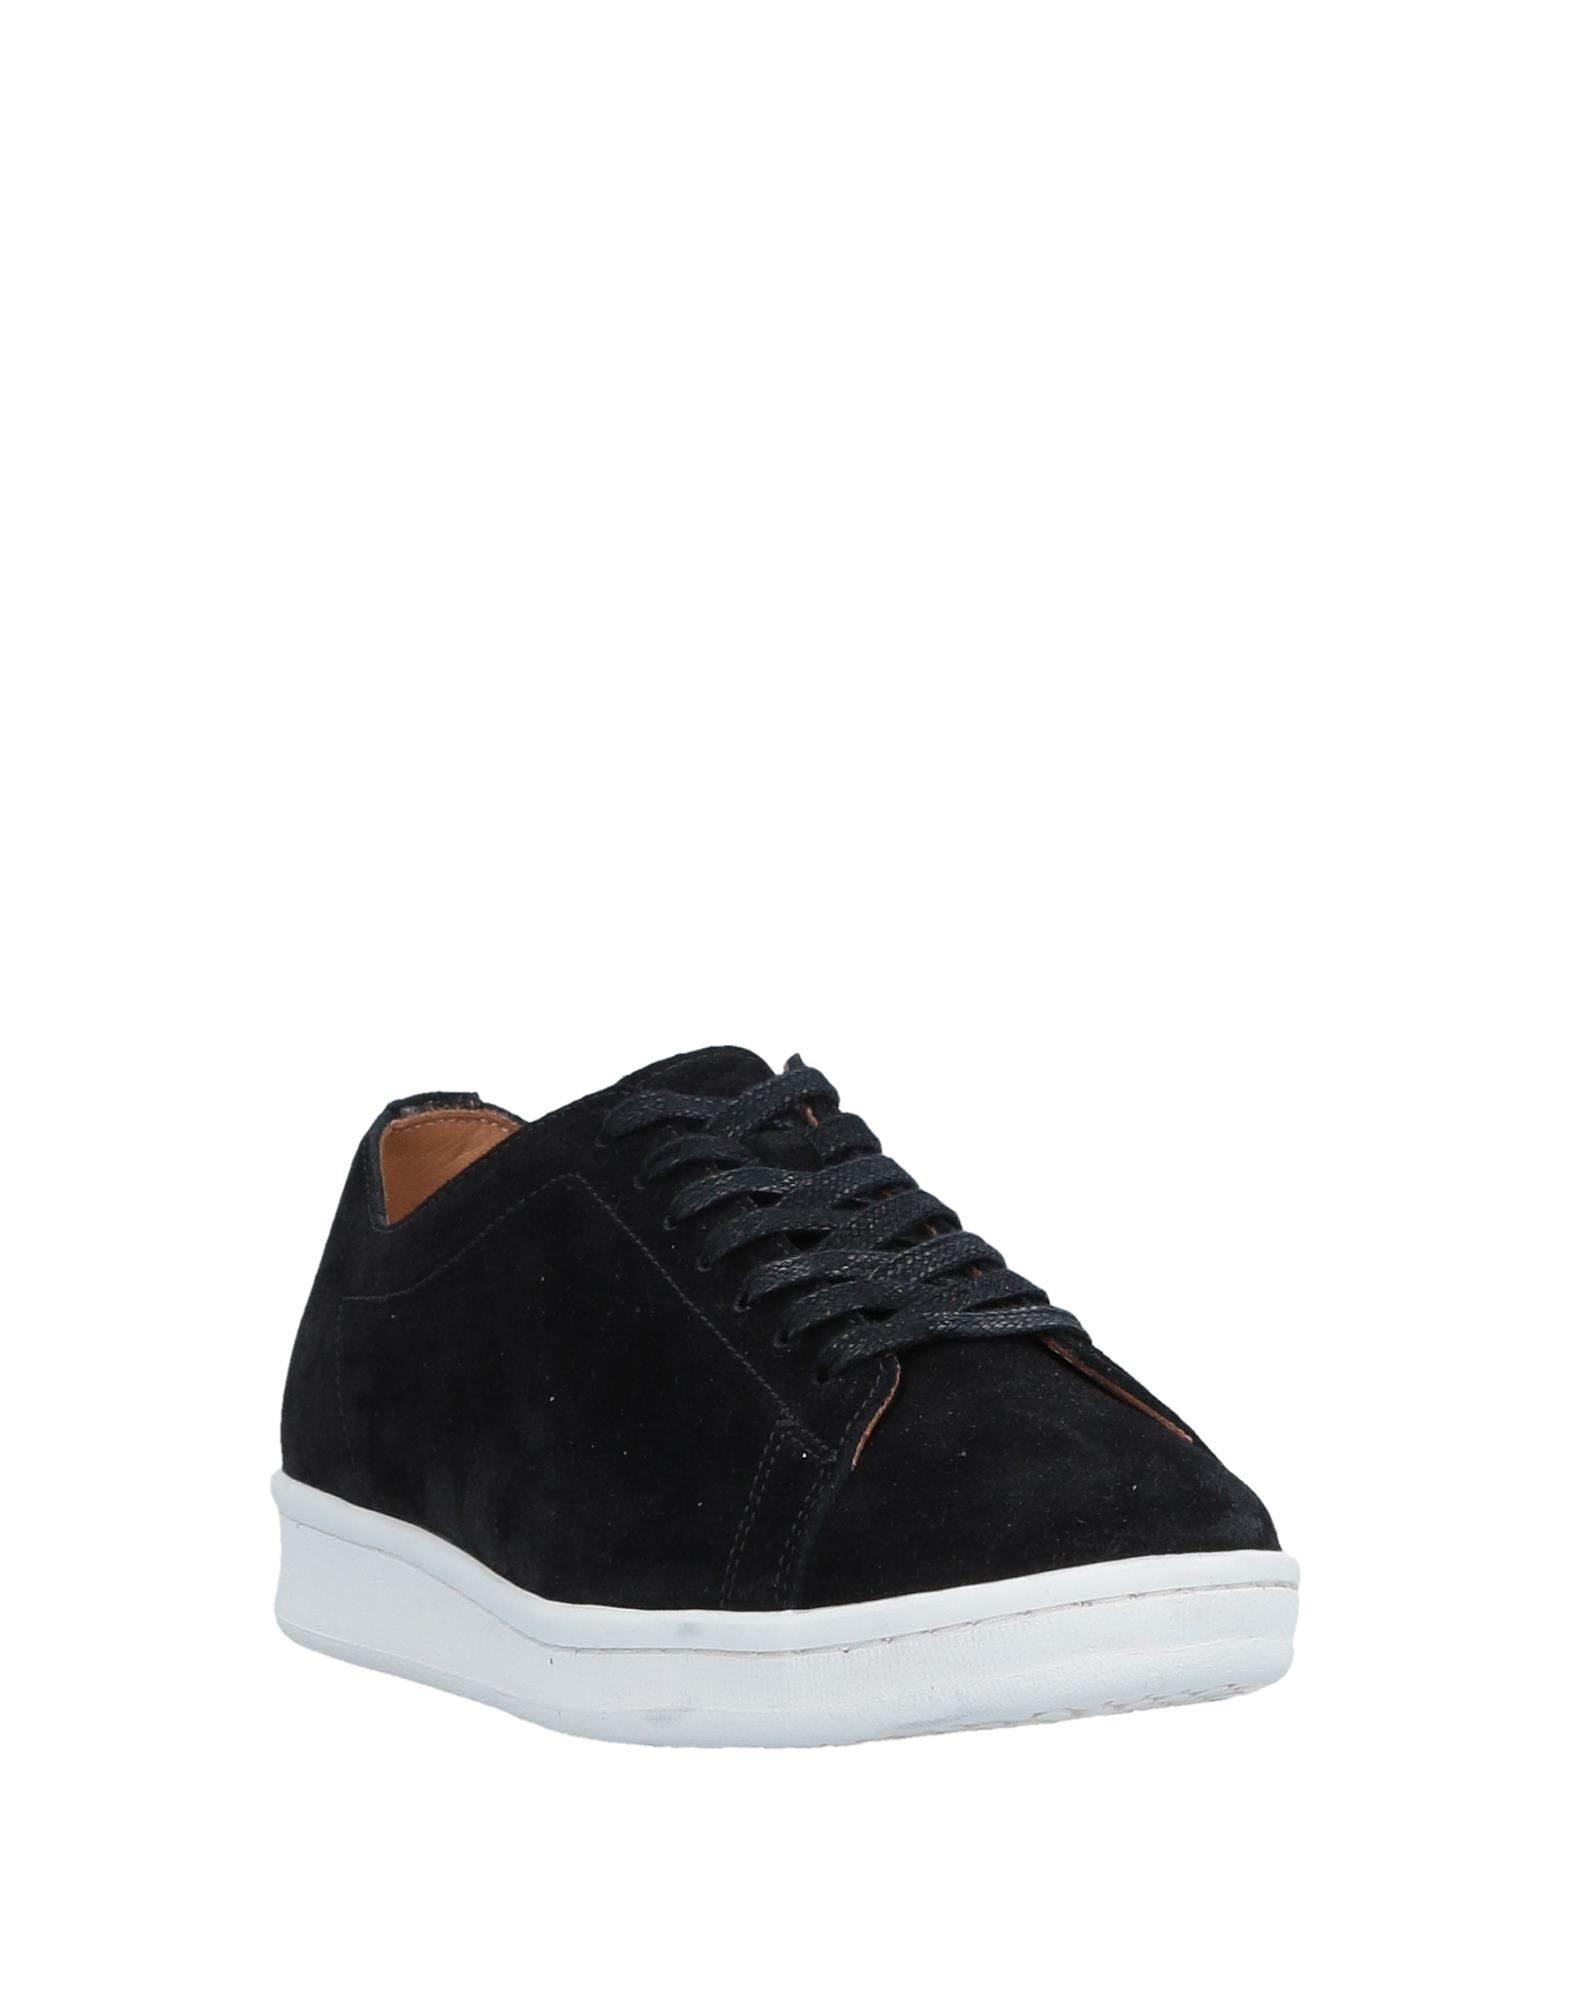 Stilvolle billige Schuhe N.D.C. Made By 11521732LH Hand Sneakers Damen  11521732LH By 7779df